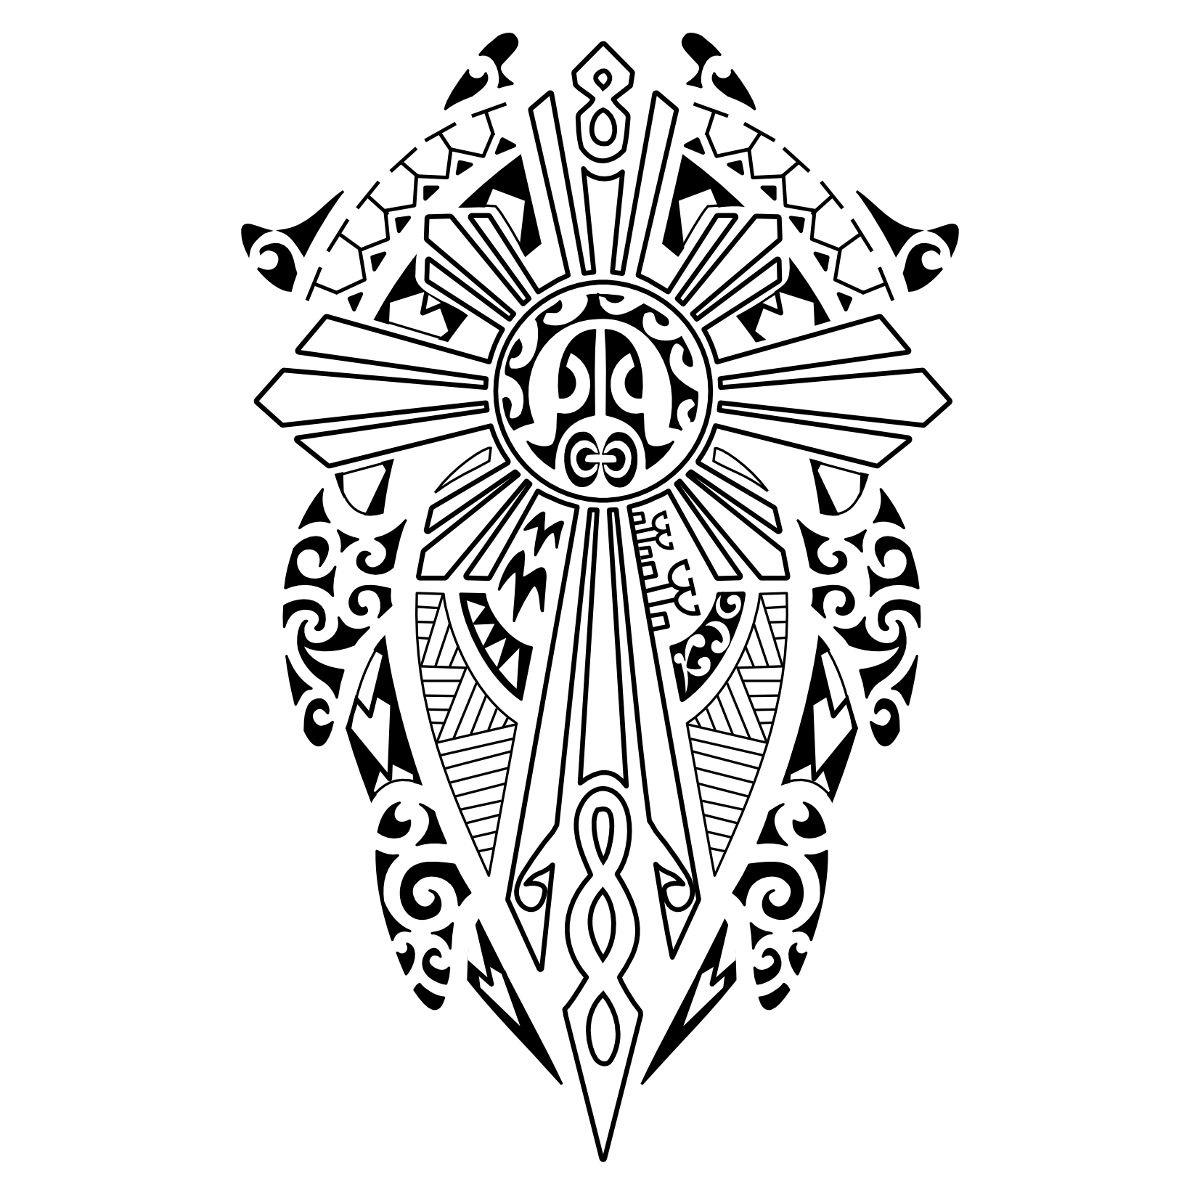 Famoso Blu Sky Tattoo Studio: Maori Significato 61 UQ71